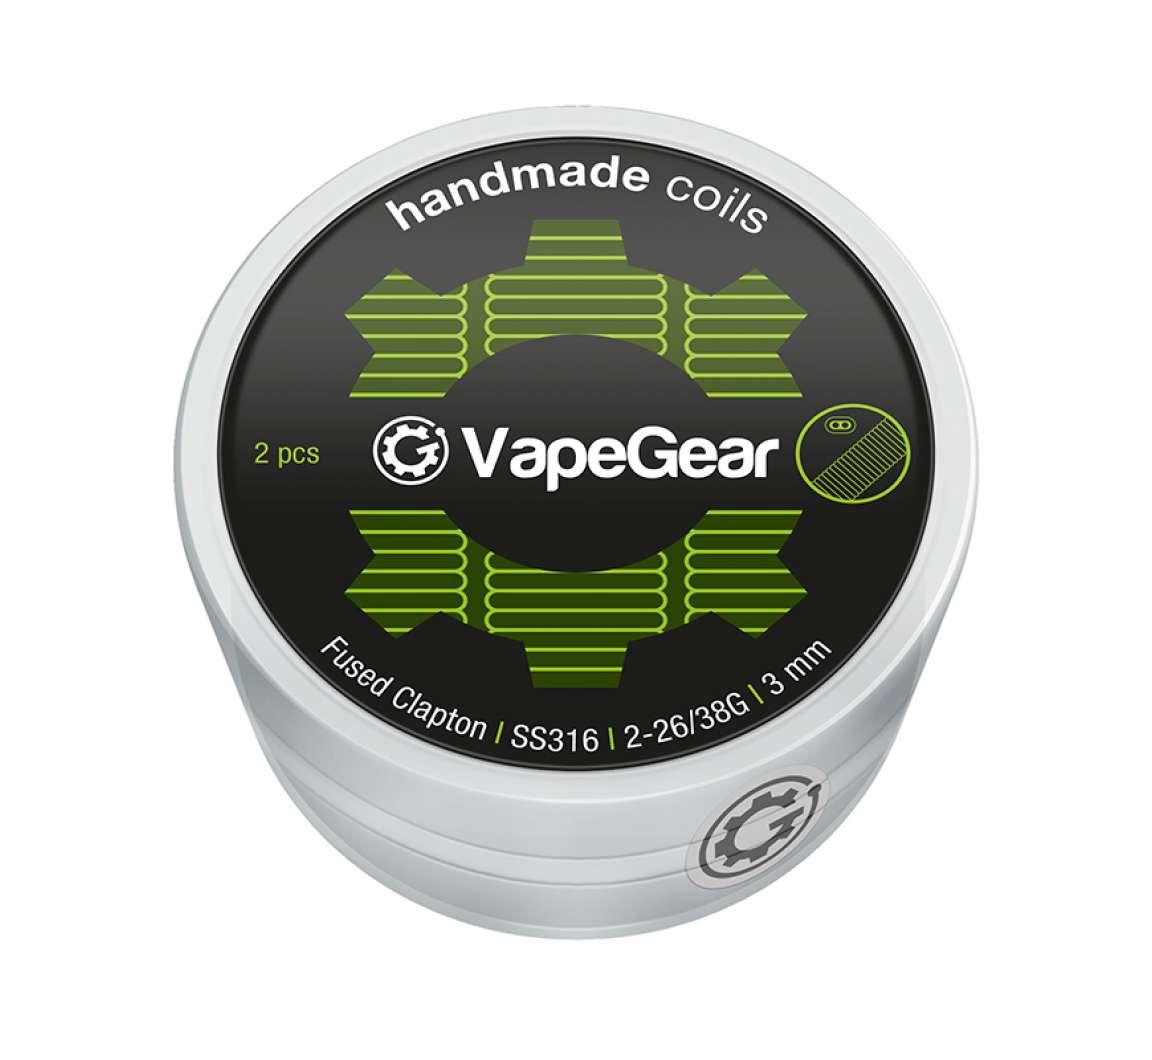 VapeGear Handmade Coils - Fused Clapton, SS316, 2ks - 2-26/38G, 3mm